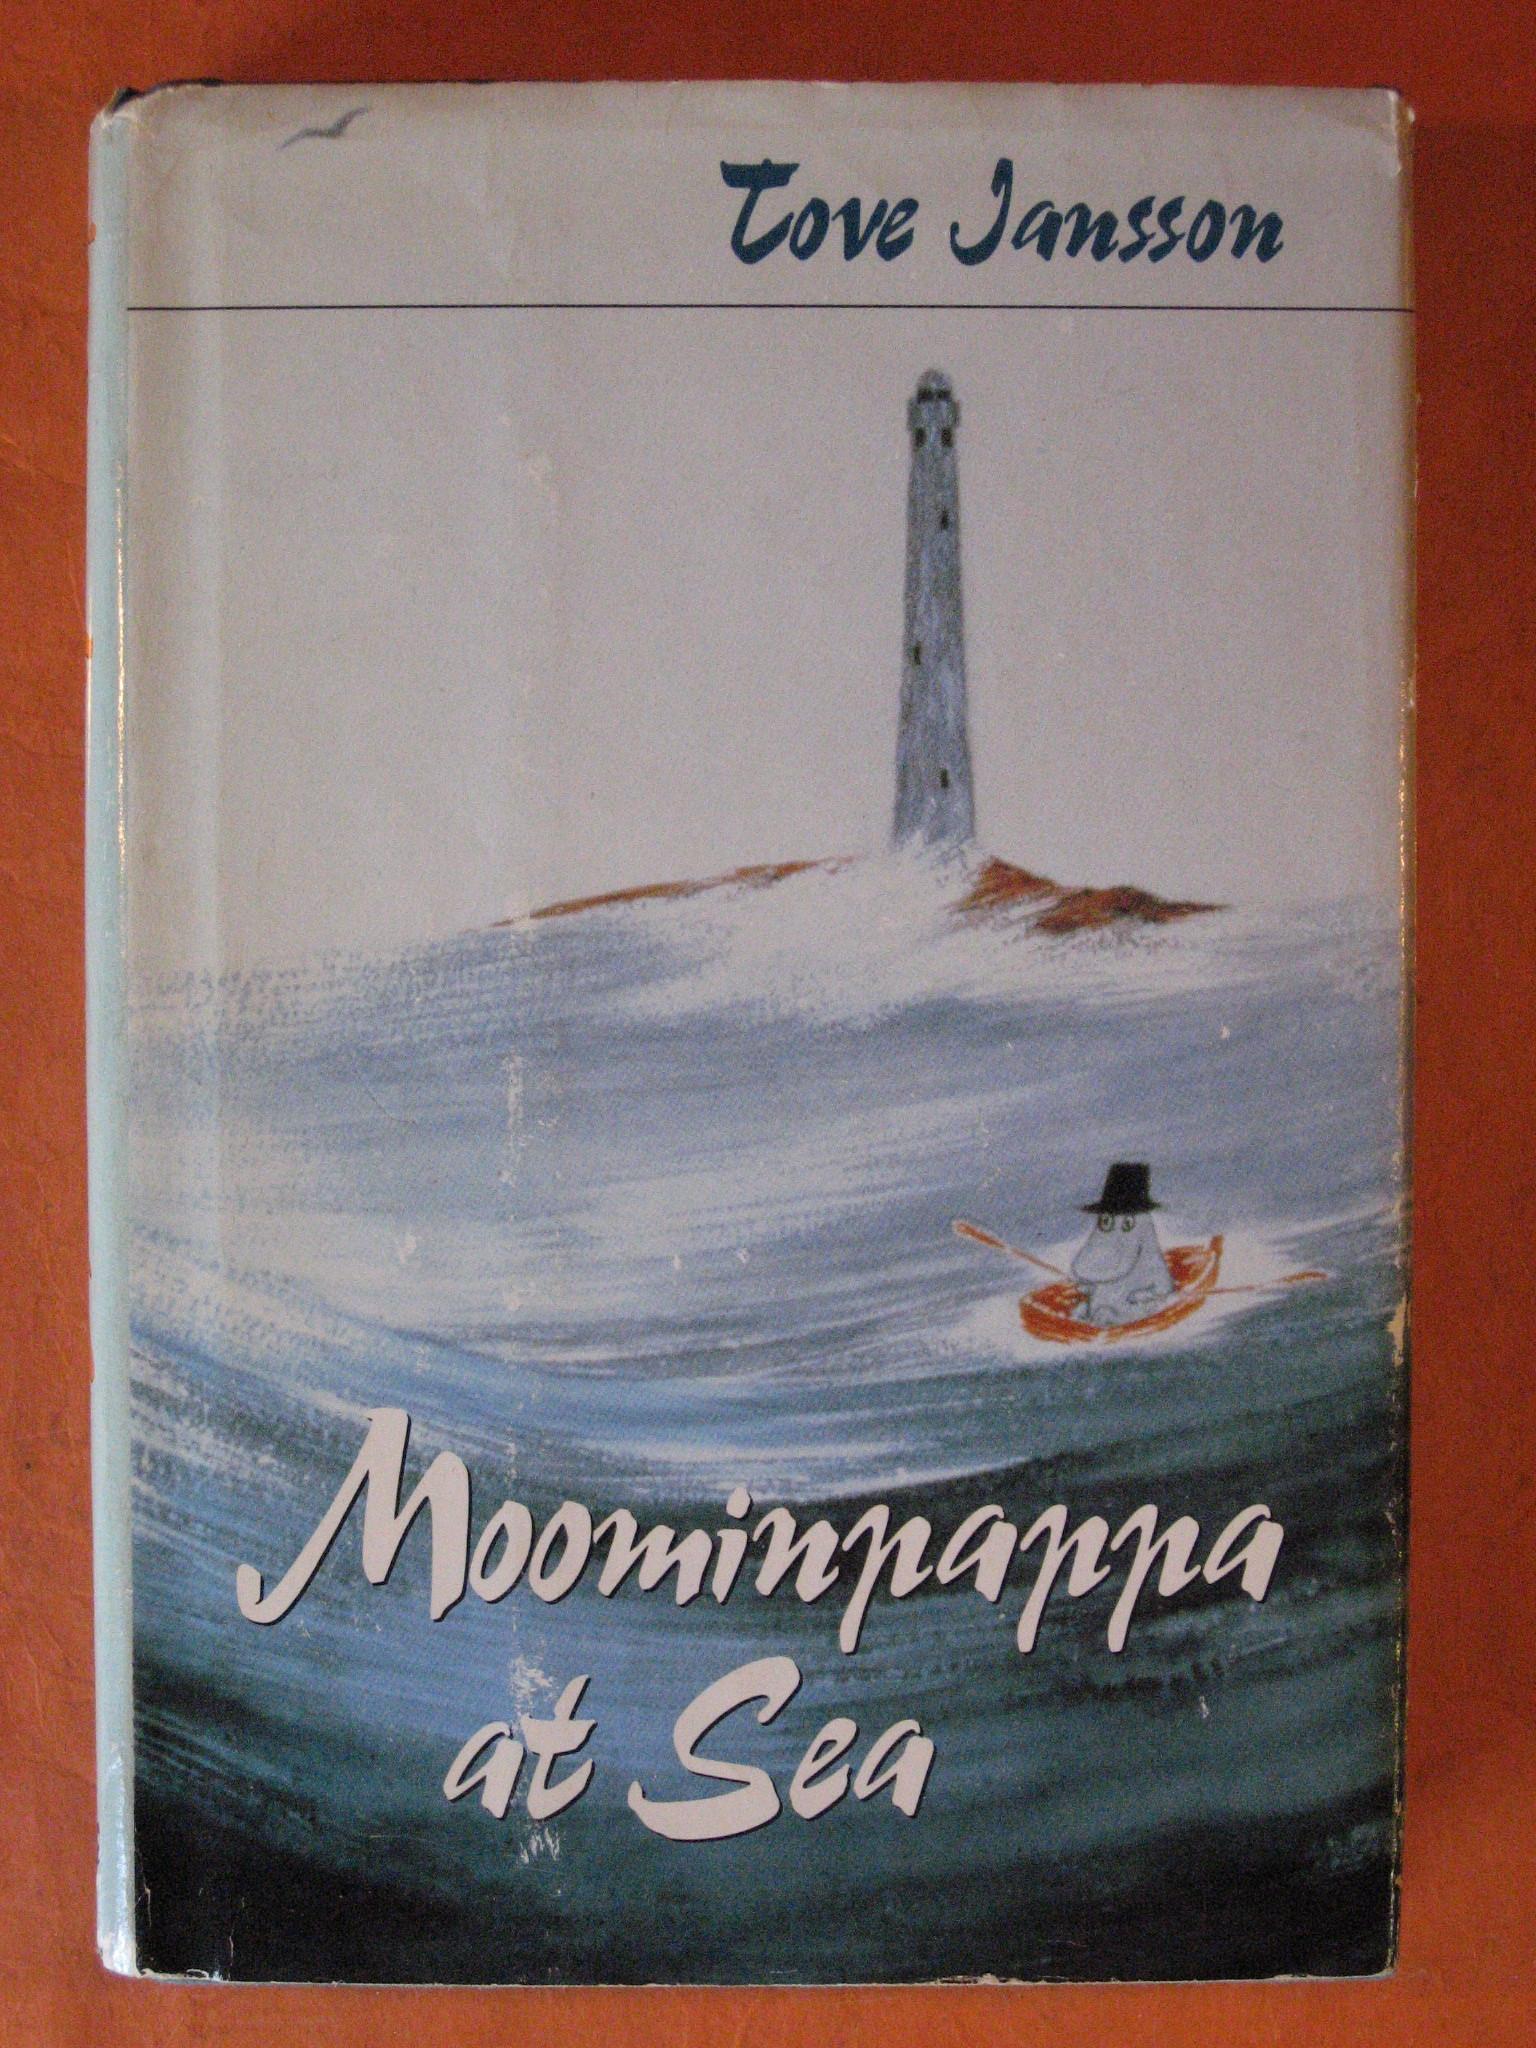 Moominpappa At Sea, Tove Jansson